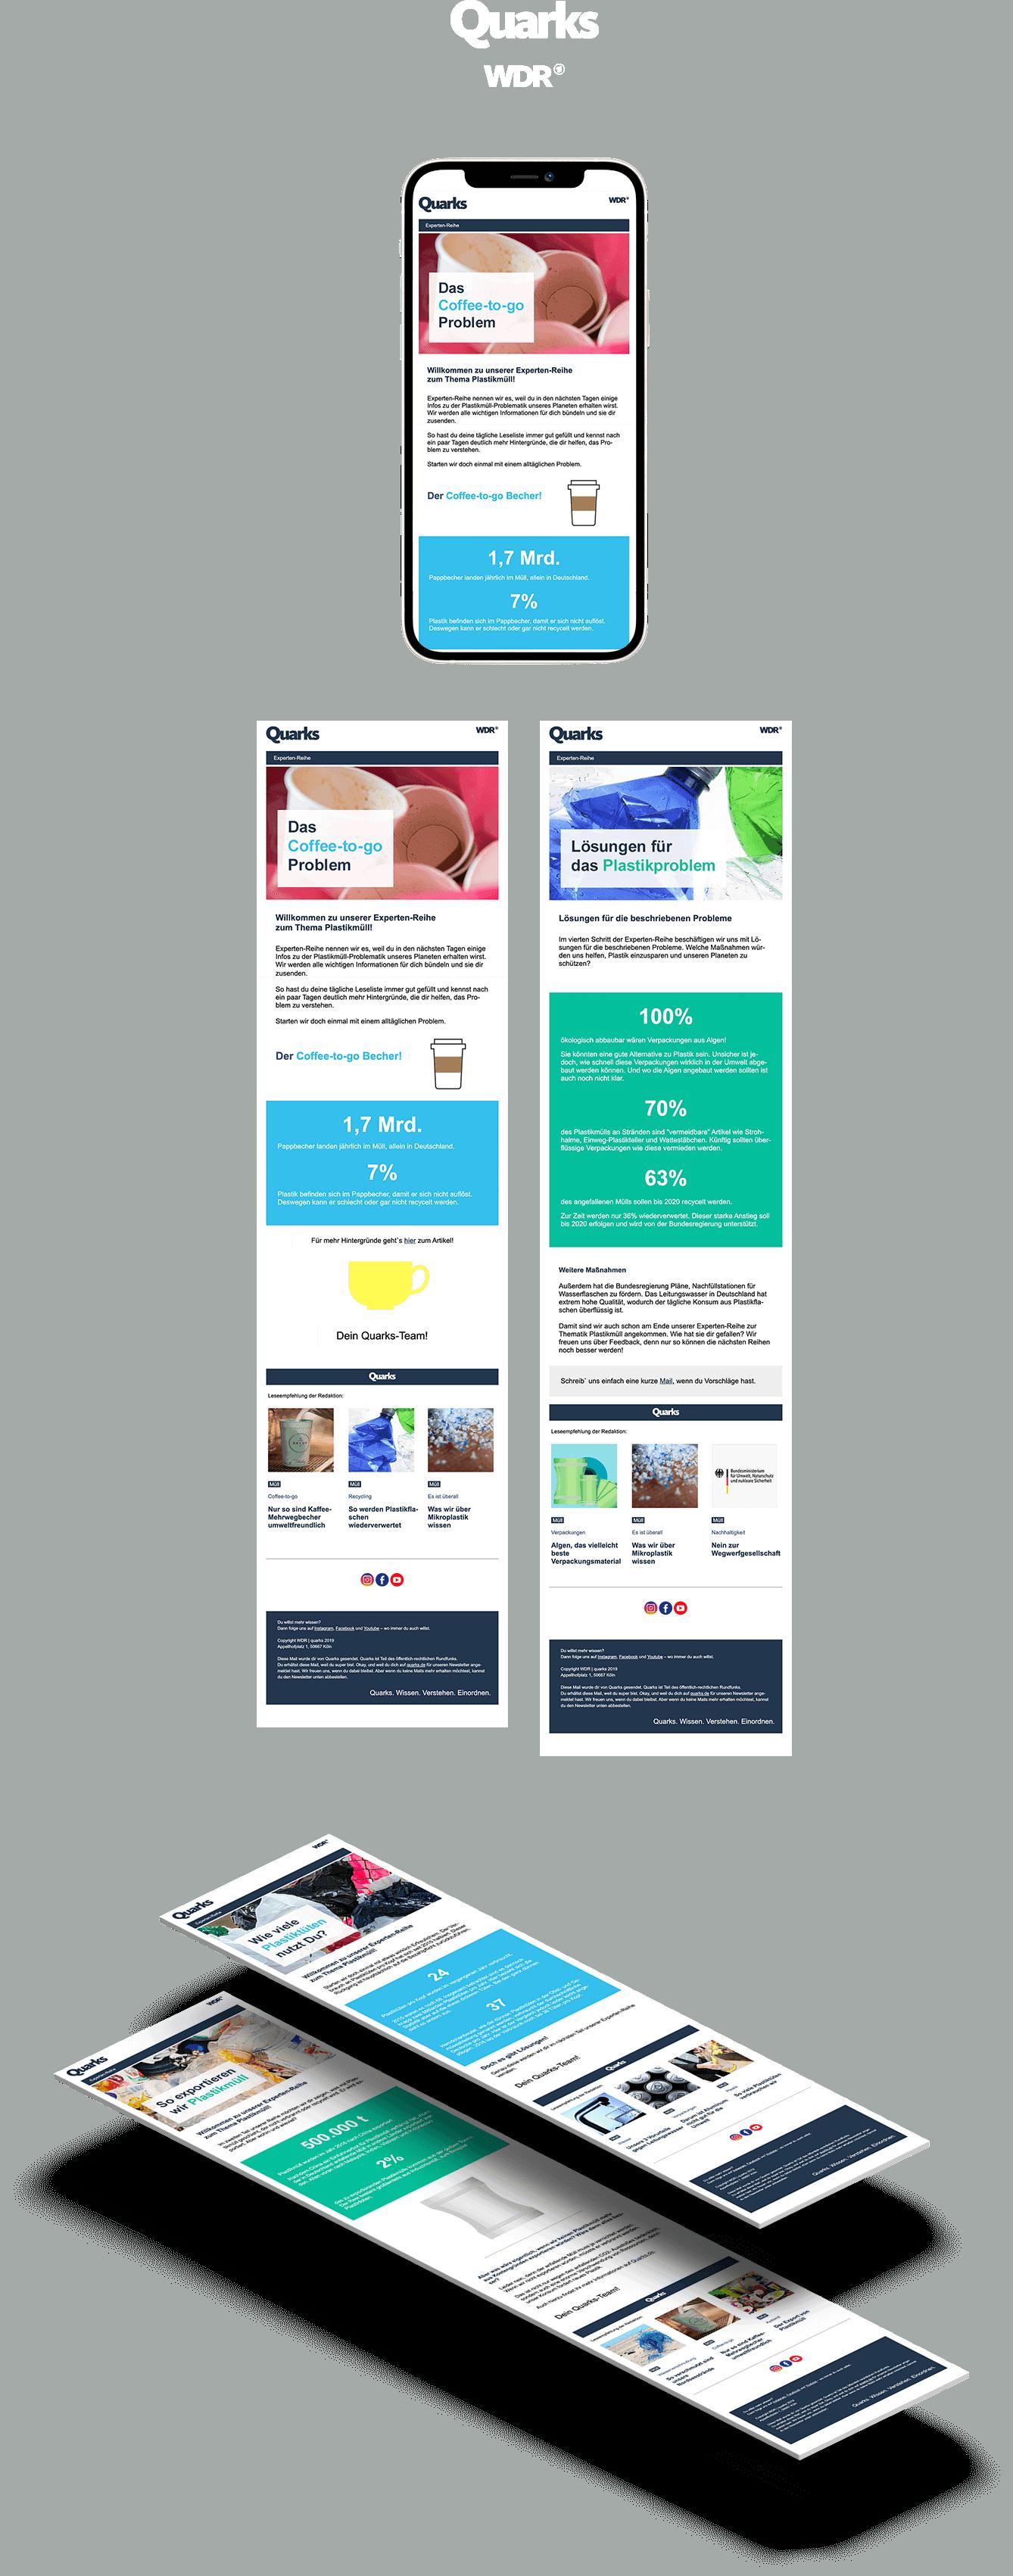 design-screendesign-ux-user-experience-grafik-koeln-thewhiteout-quarks-wdr